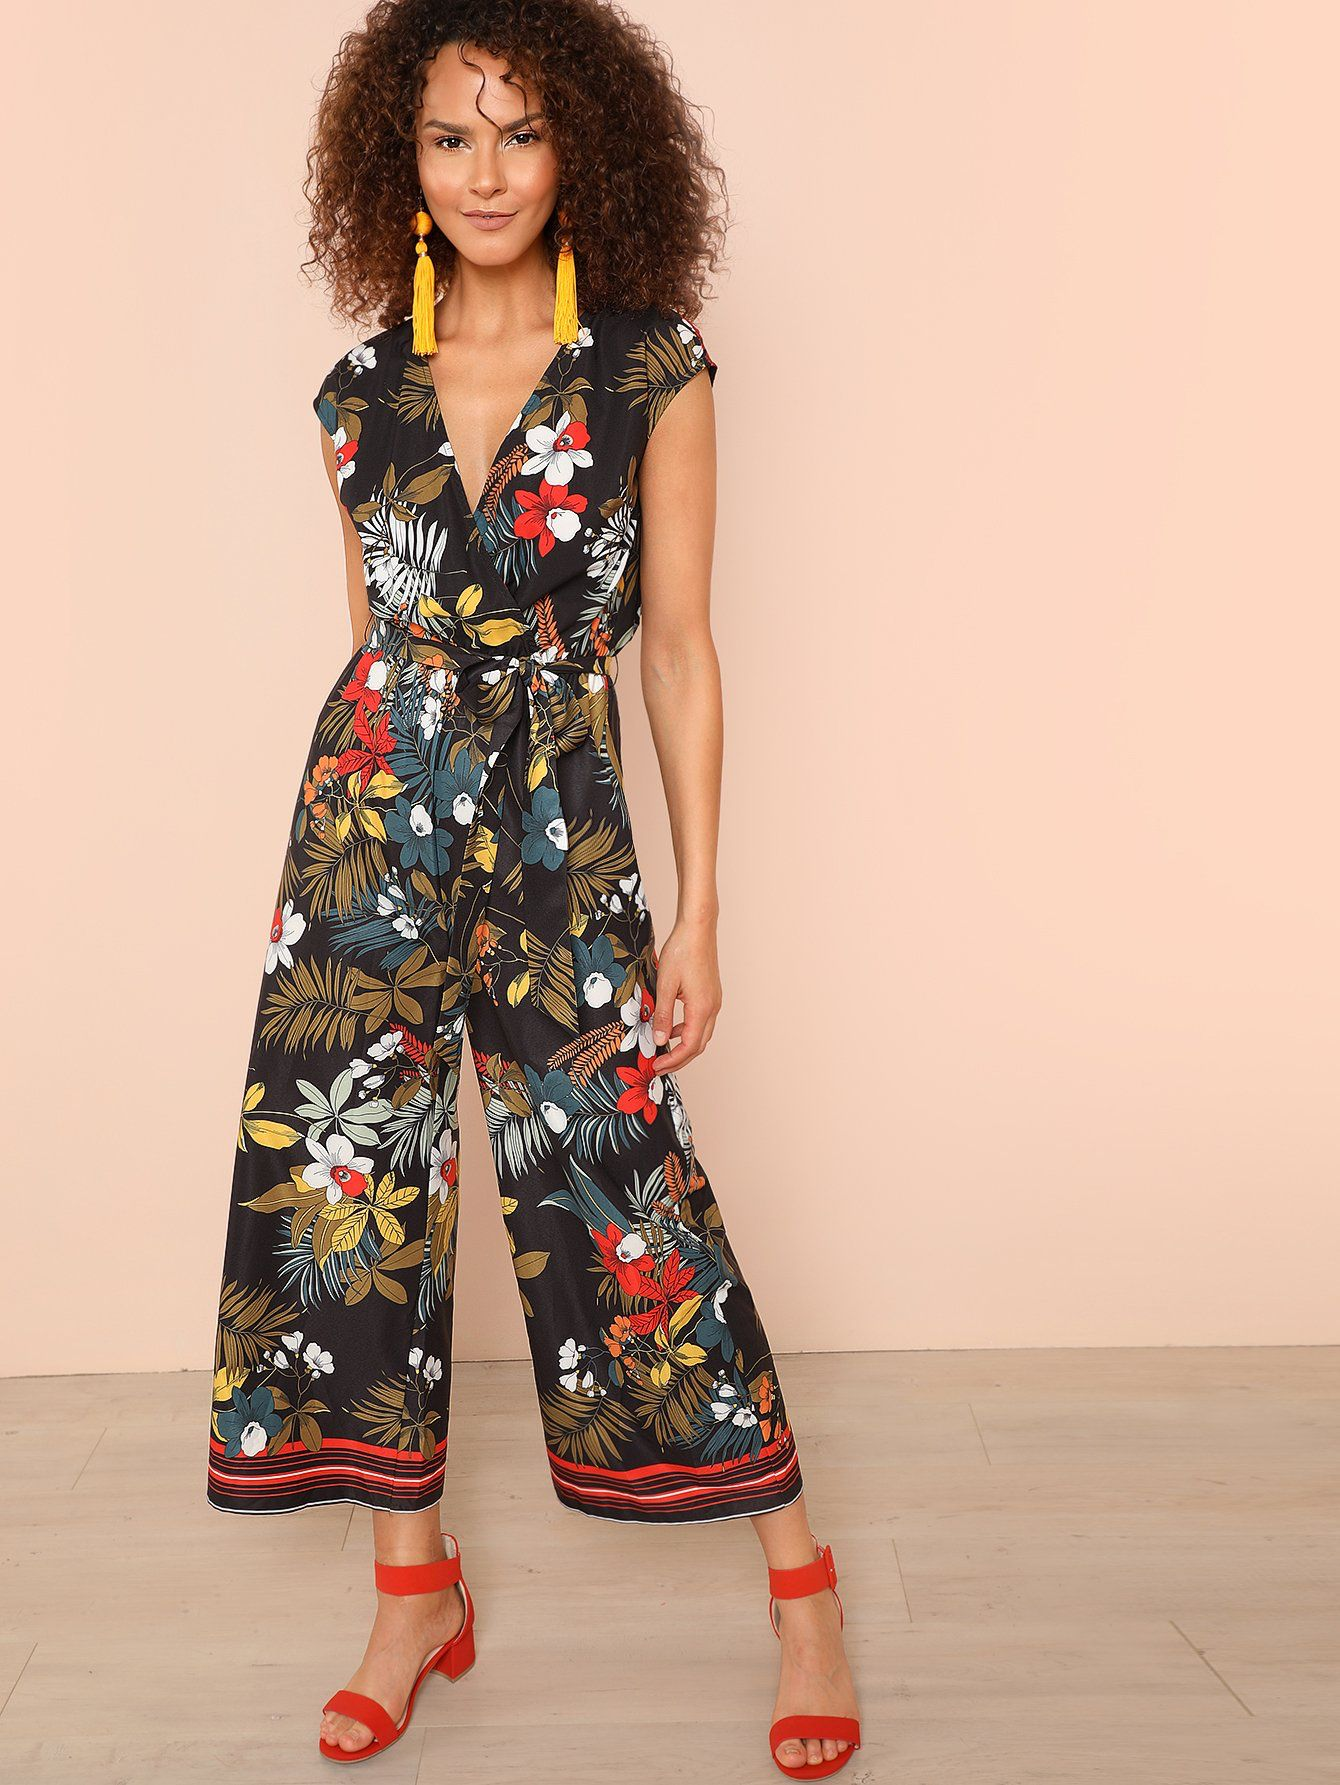 0308362d7f87 Tropical Print Stripe Tape Hem Straight Leg Jumpsuit Check out this  Tropical Print Stripe Tape Hem Straight Leg Jumpsuit on SHEIN and explore  more to meet ...